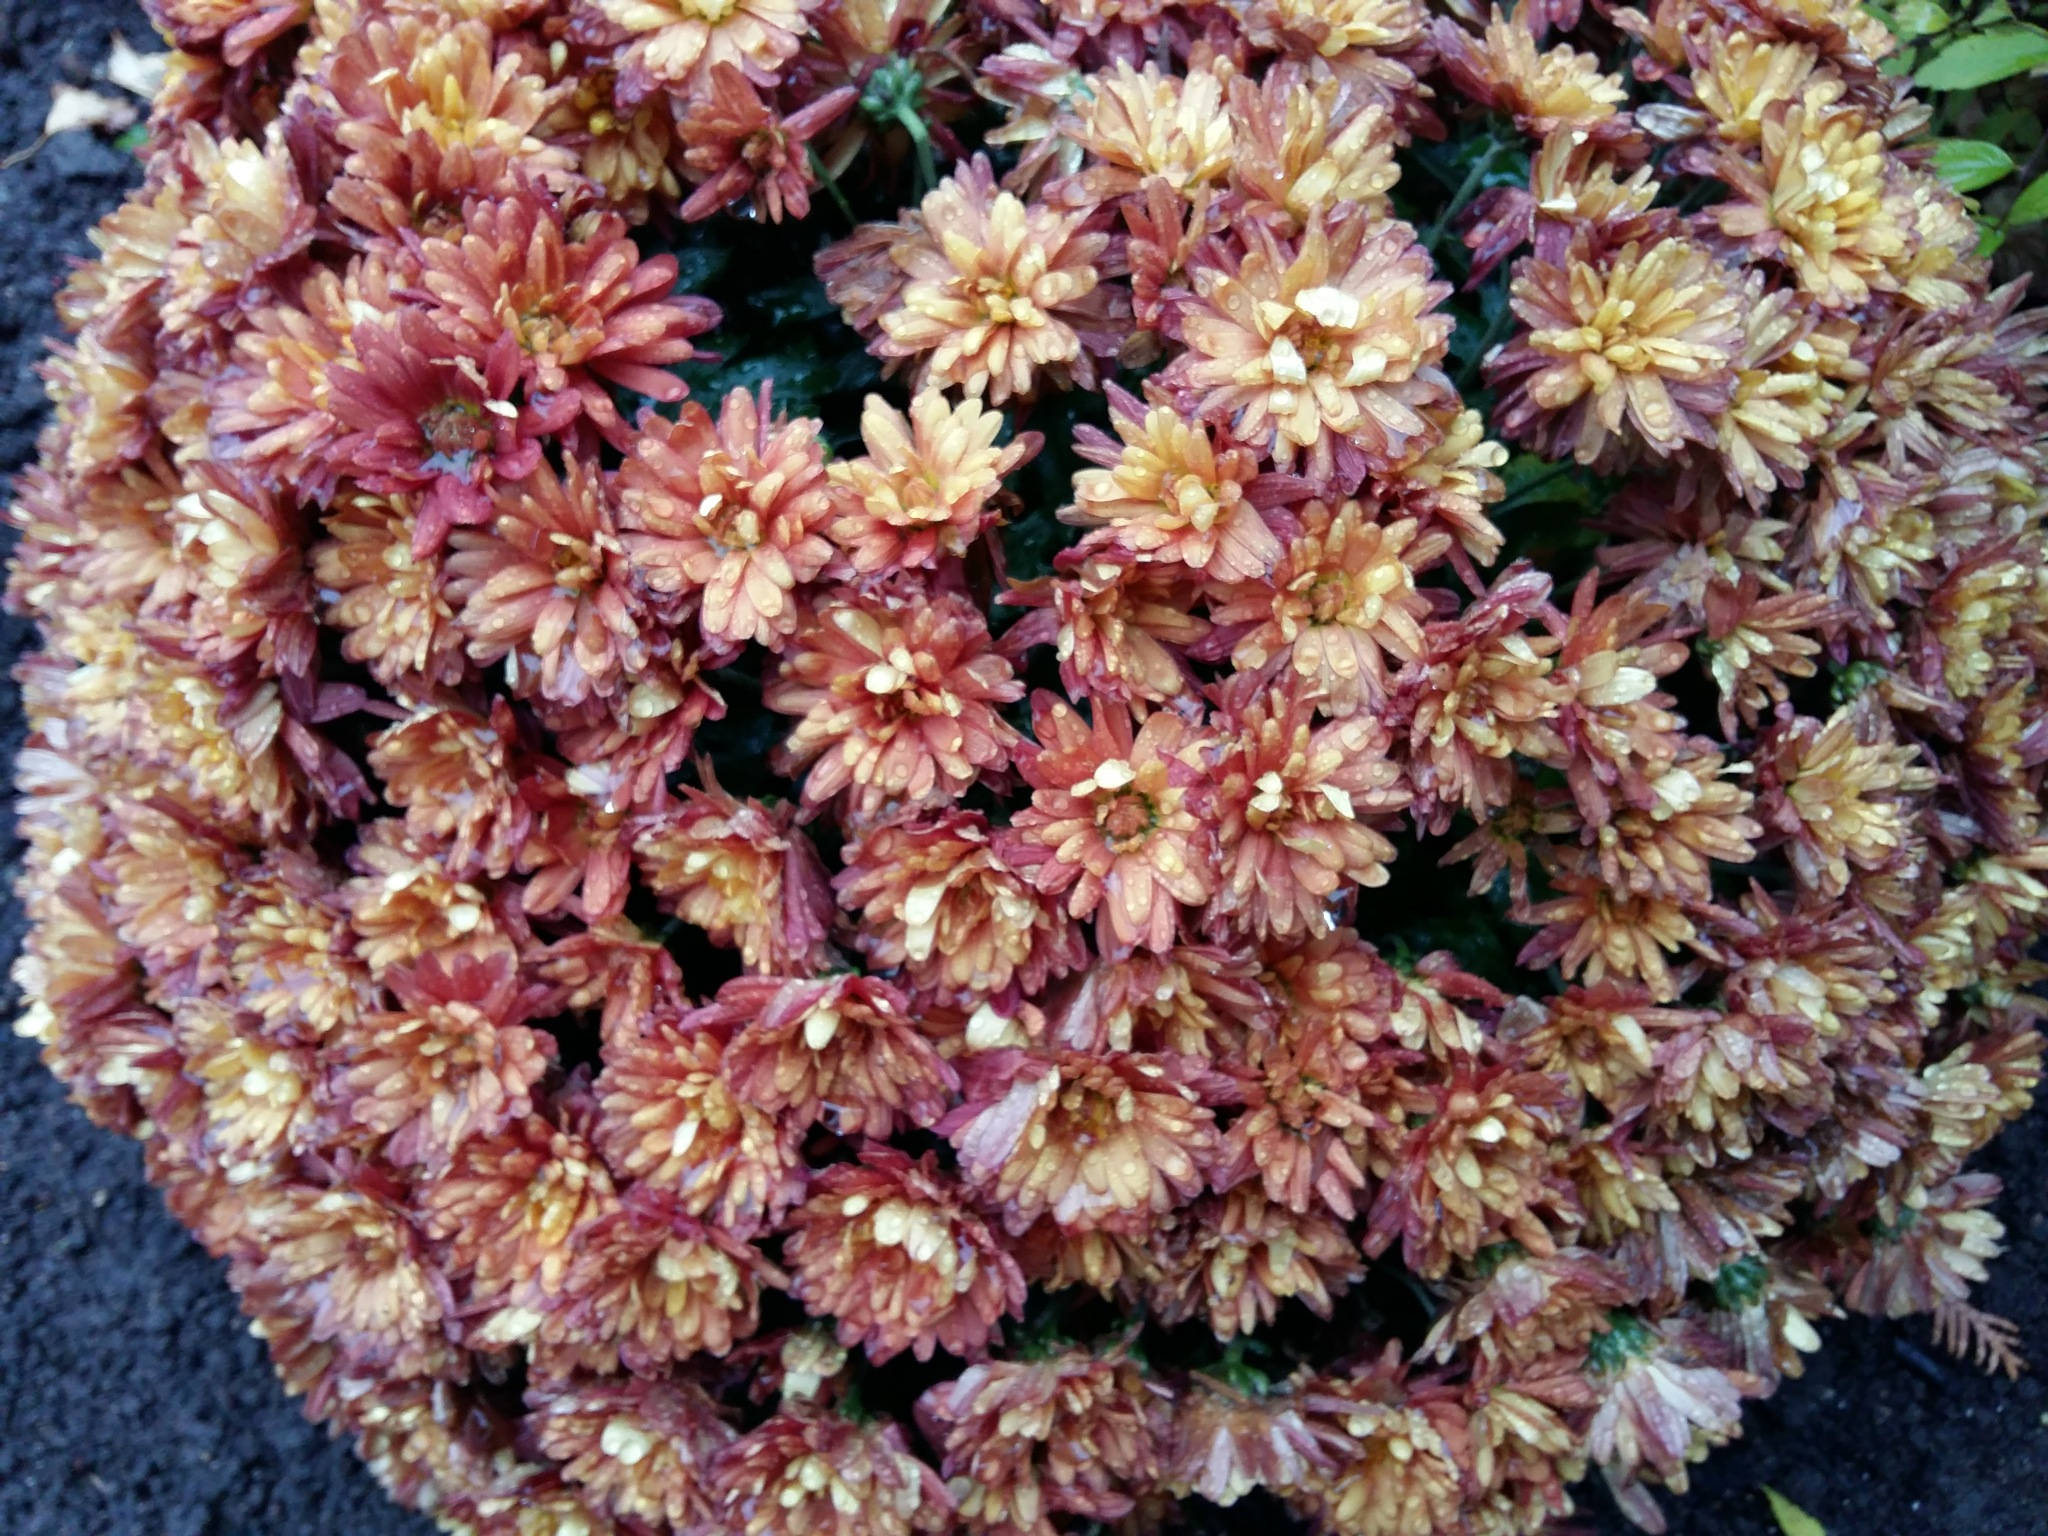 Flowers after rain by uzkuraitiene62